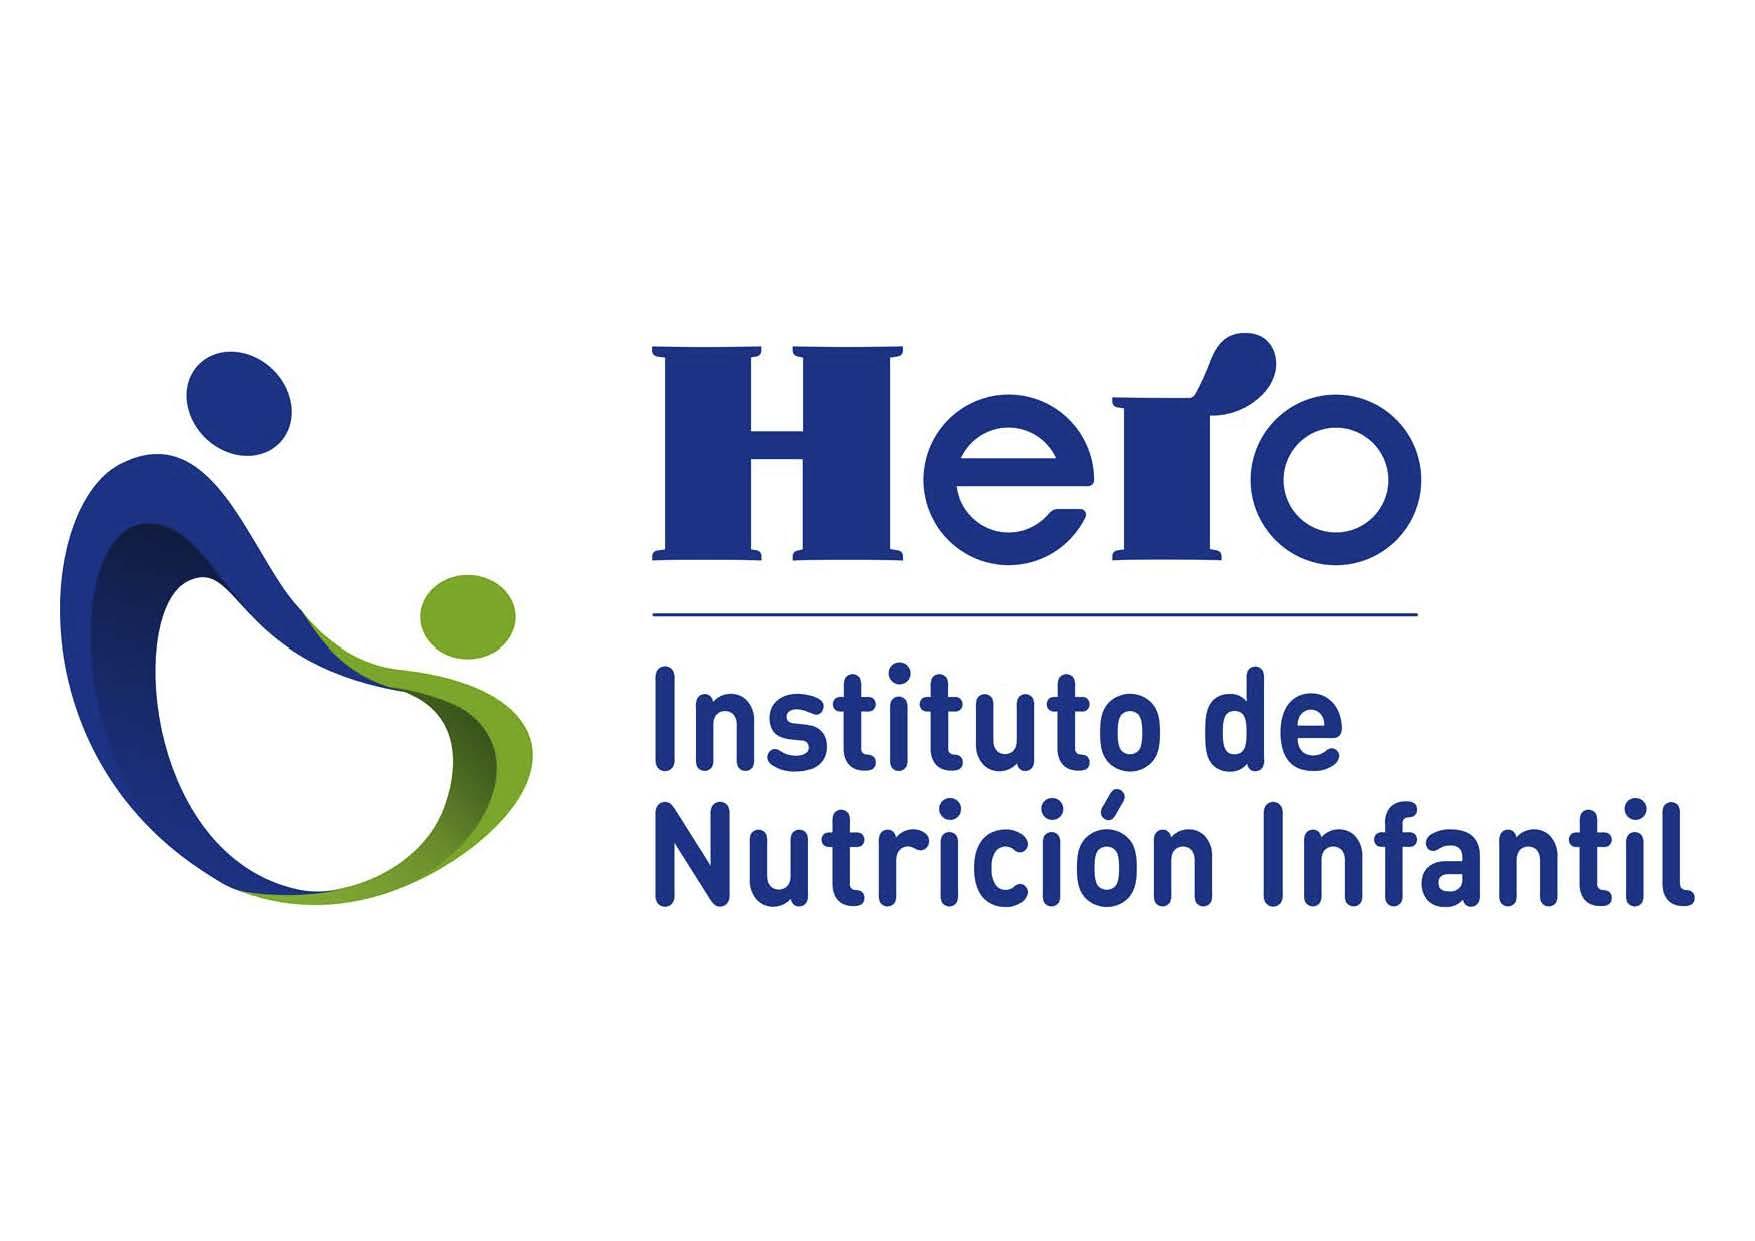 HERO Instituto de Nutricion Infantil